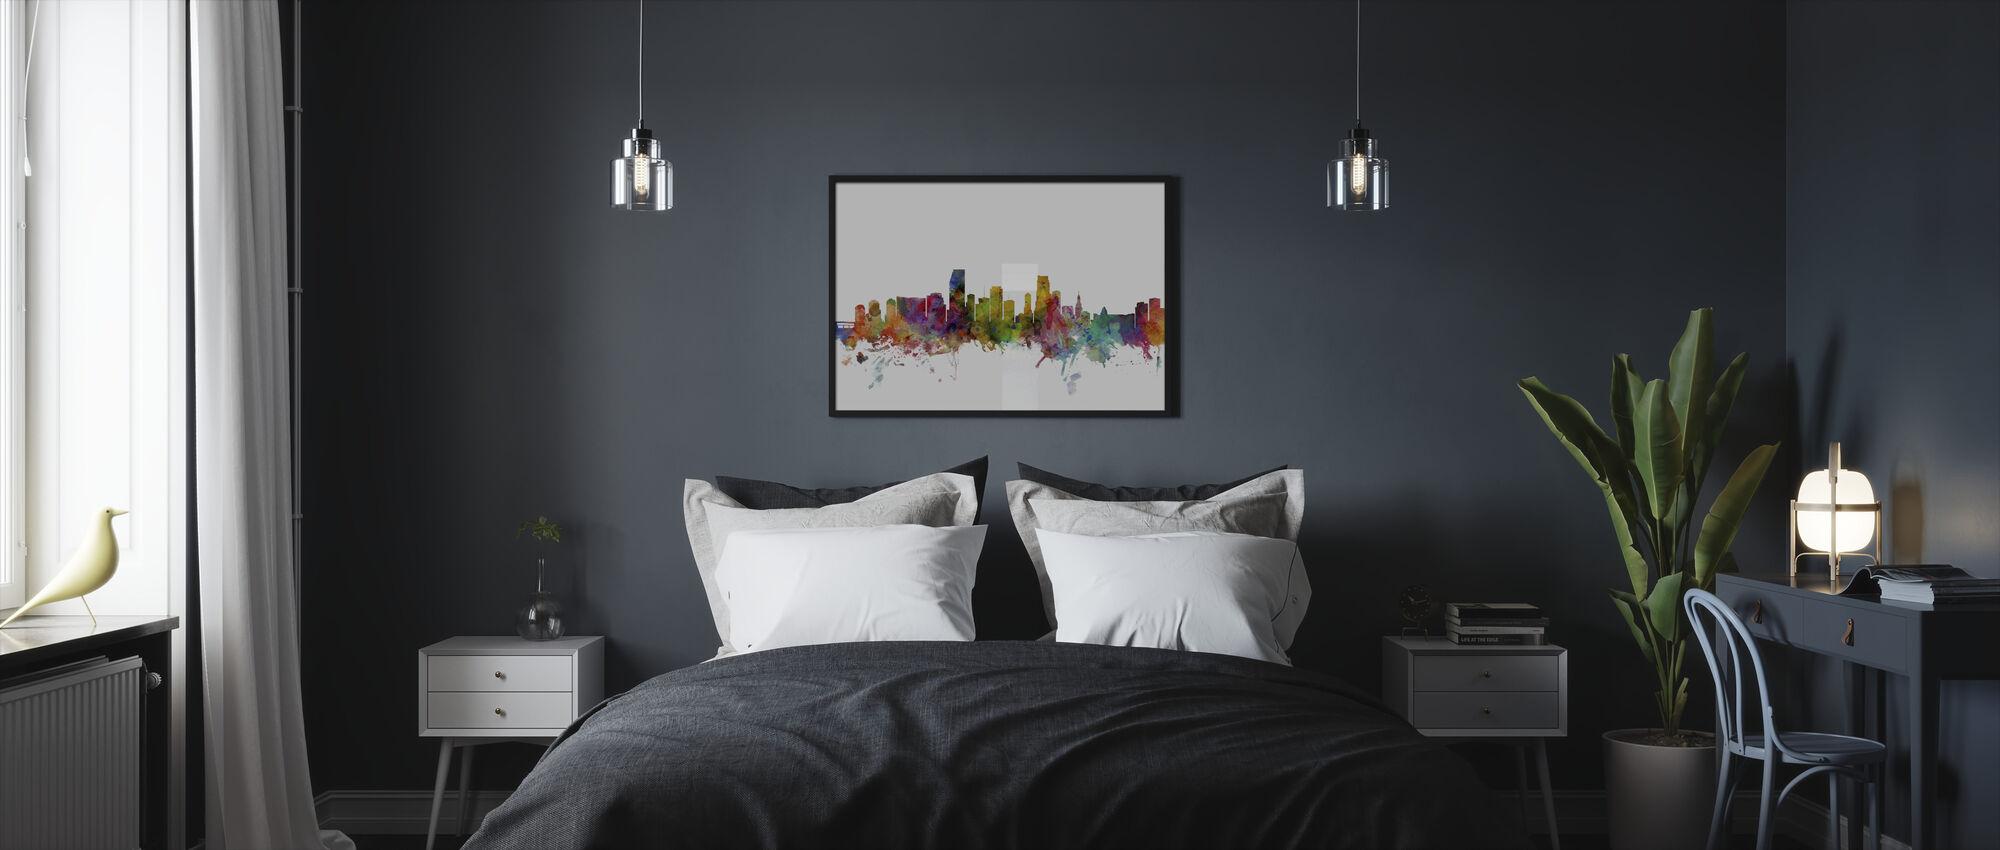 Miami Florida Skyline - Framed print - Bedroom